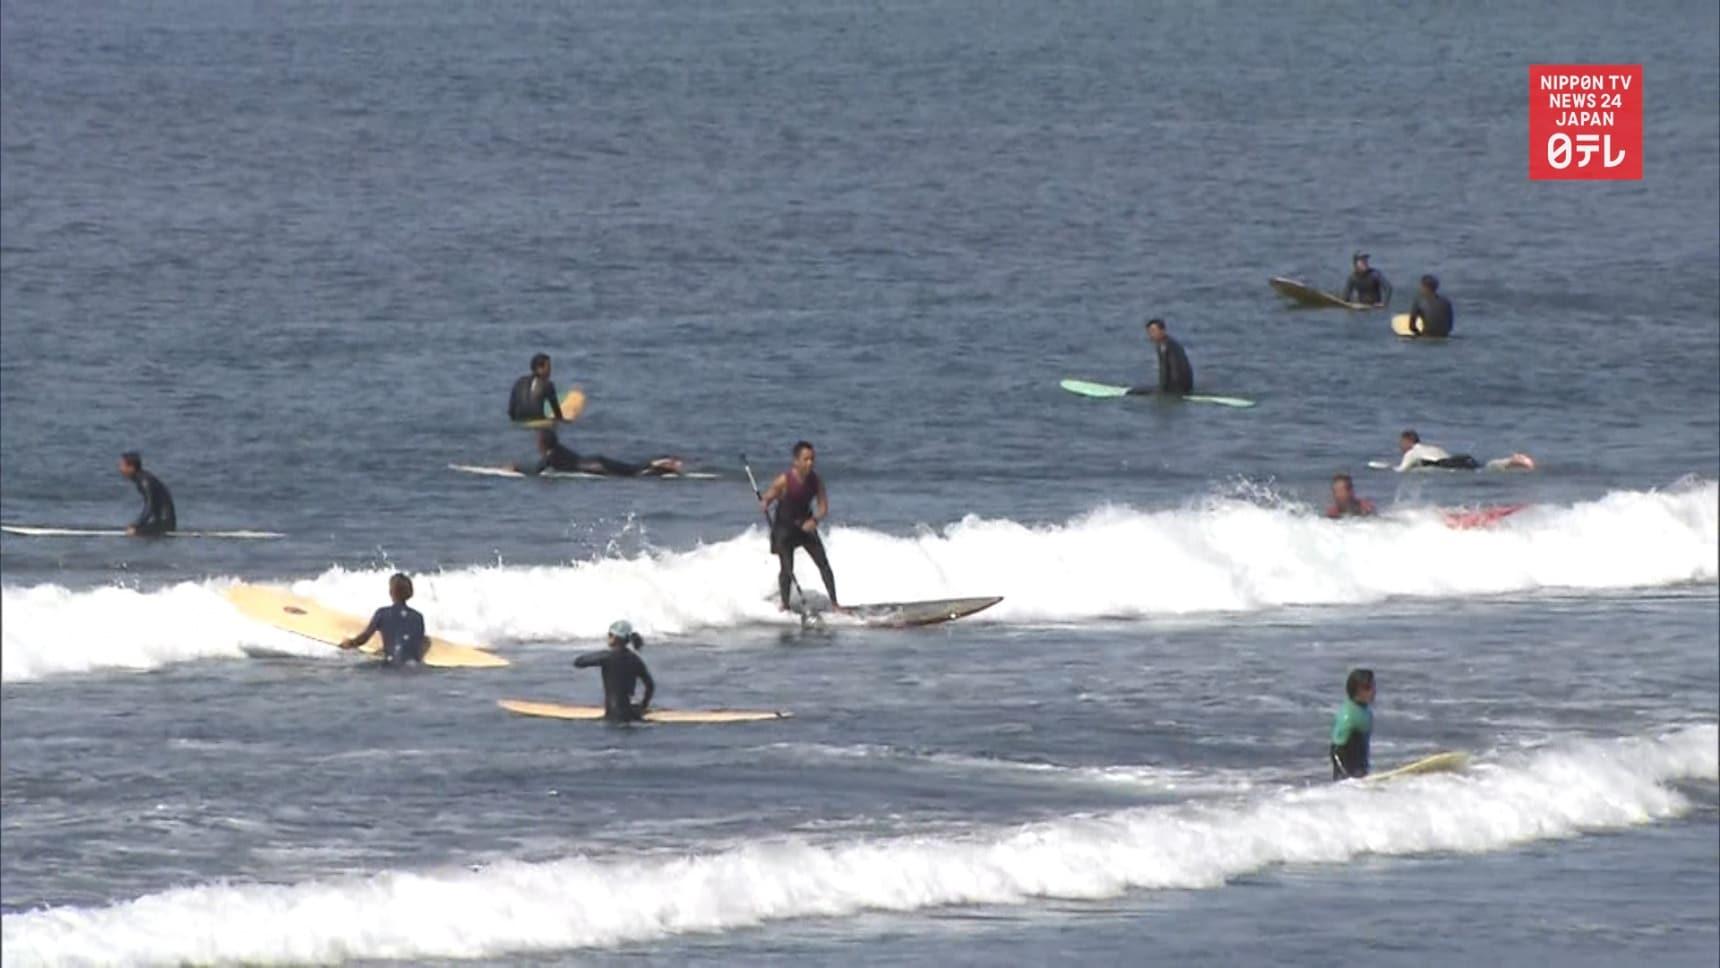 Kanagawa Prefecture Tells Visitors to Stay Put